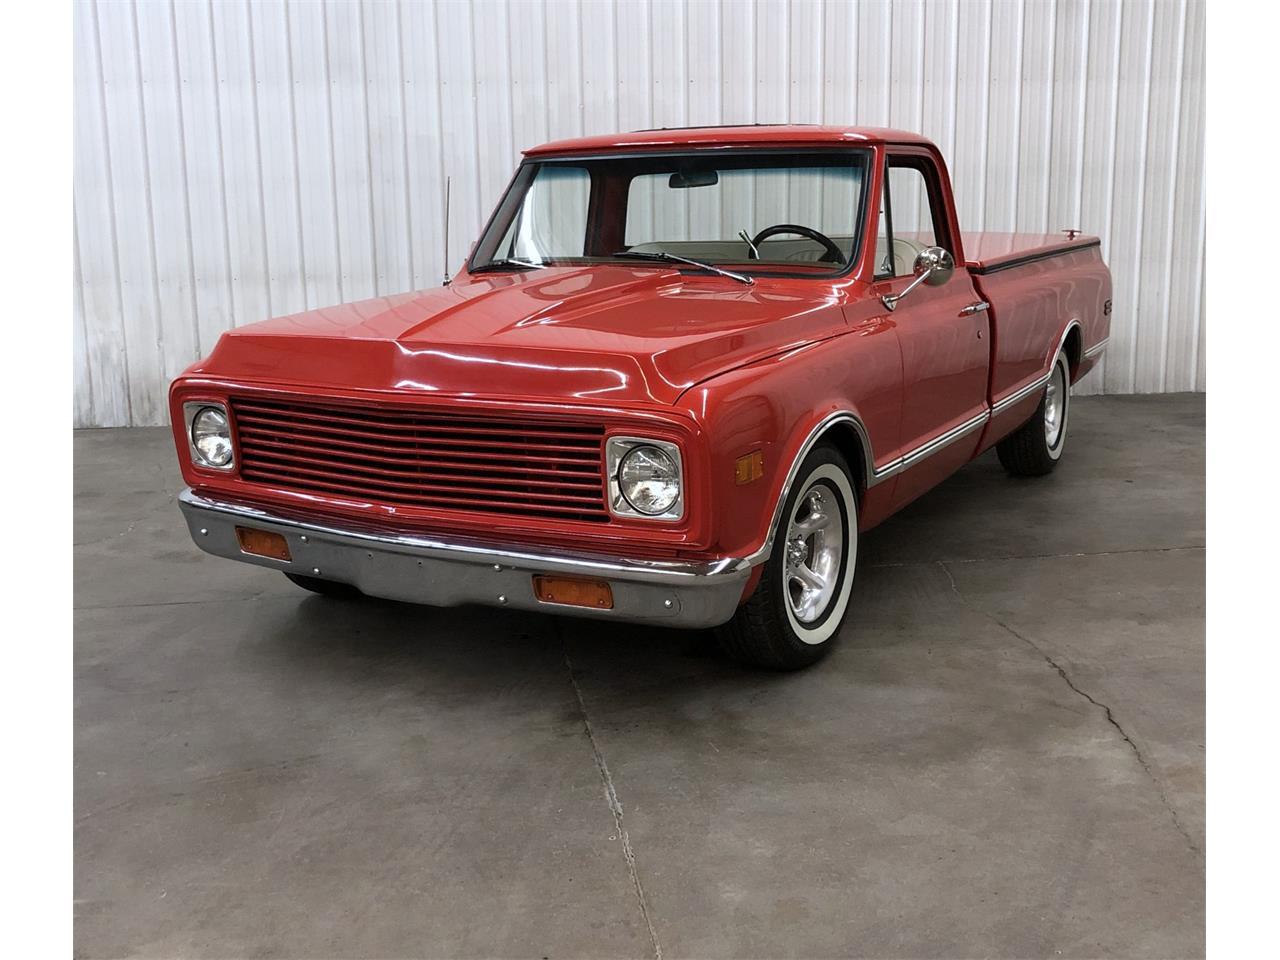 1969 Chevrolet C10 (CC-1321134) for sale in Maple Lake, Minnesota